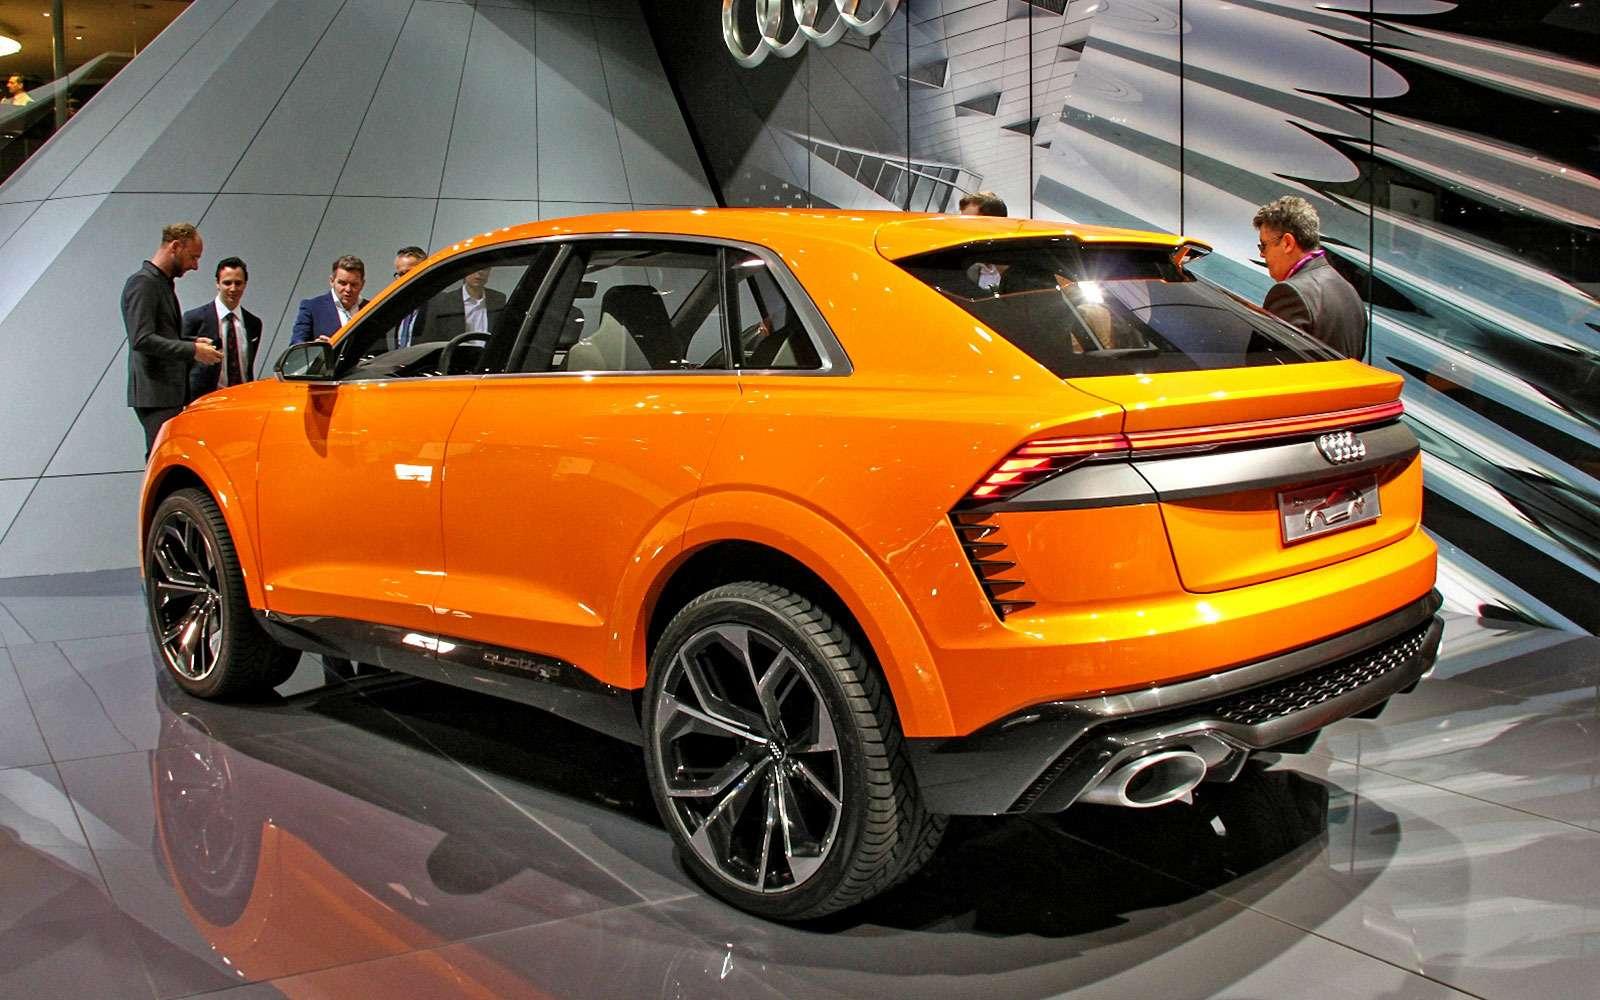 Концепт-тюнинг: Audi Q8приехал вЖеневу сэлектрическим наддувом— фото 717684